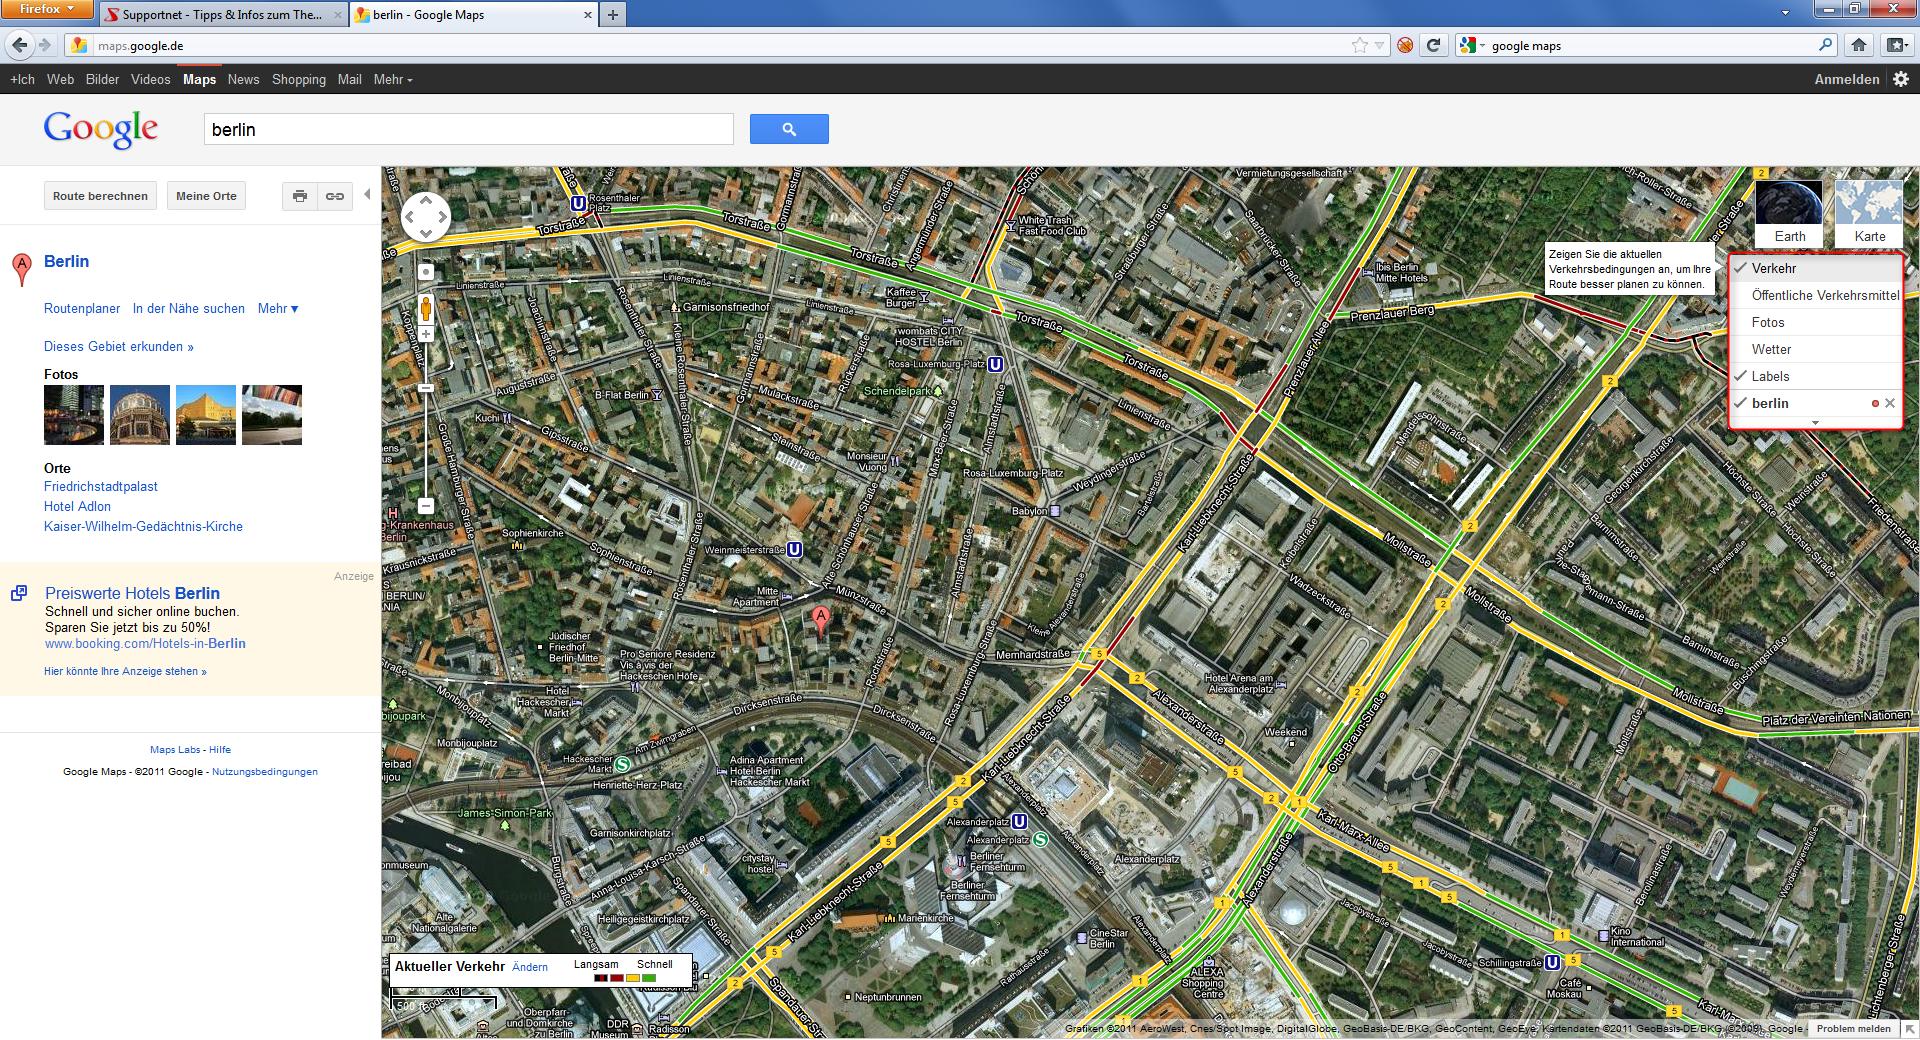 google maps die welt von oben video supportnet. Black Bedroom Furniture Sets. Home Design Ideas